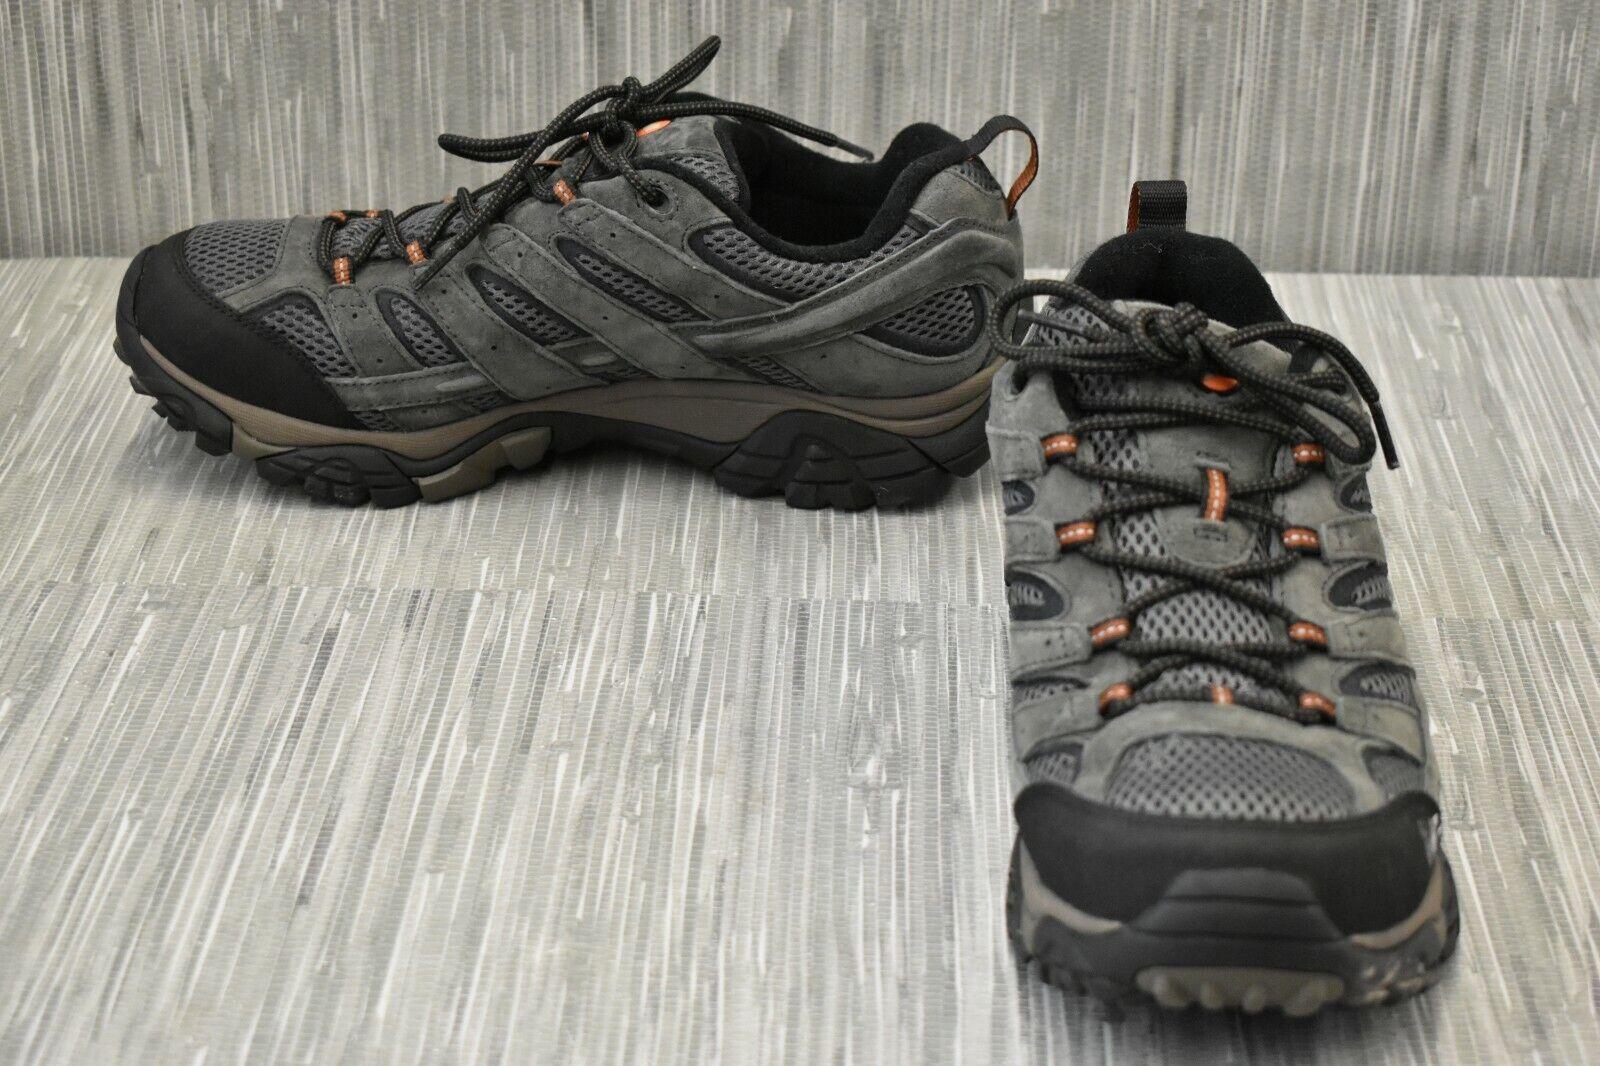 Merrell Moab 2 Waterproof J06029 Hiking Shoes, Men's Size 11